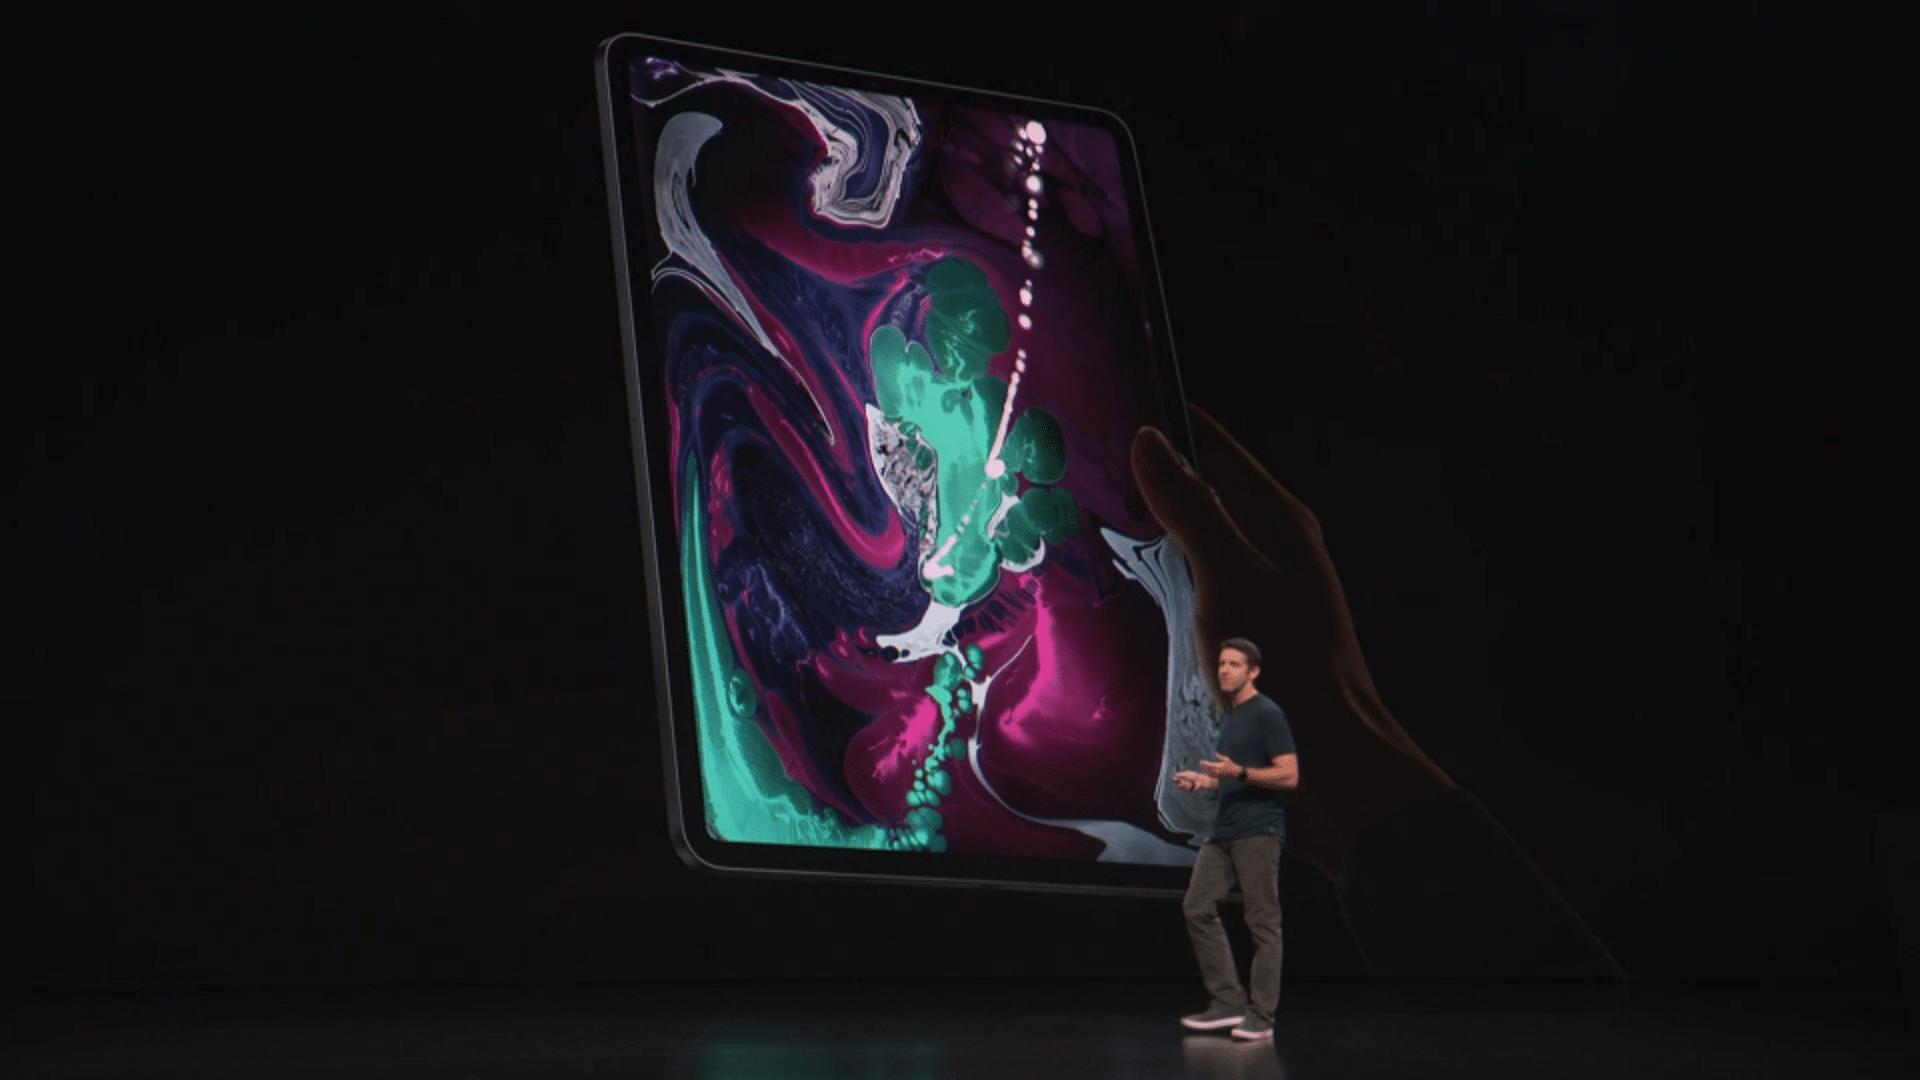 كل ماتريد معرفته عن iPad Pro 2018 1